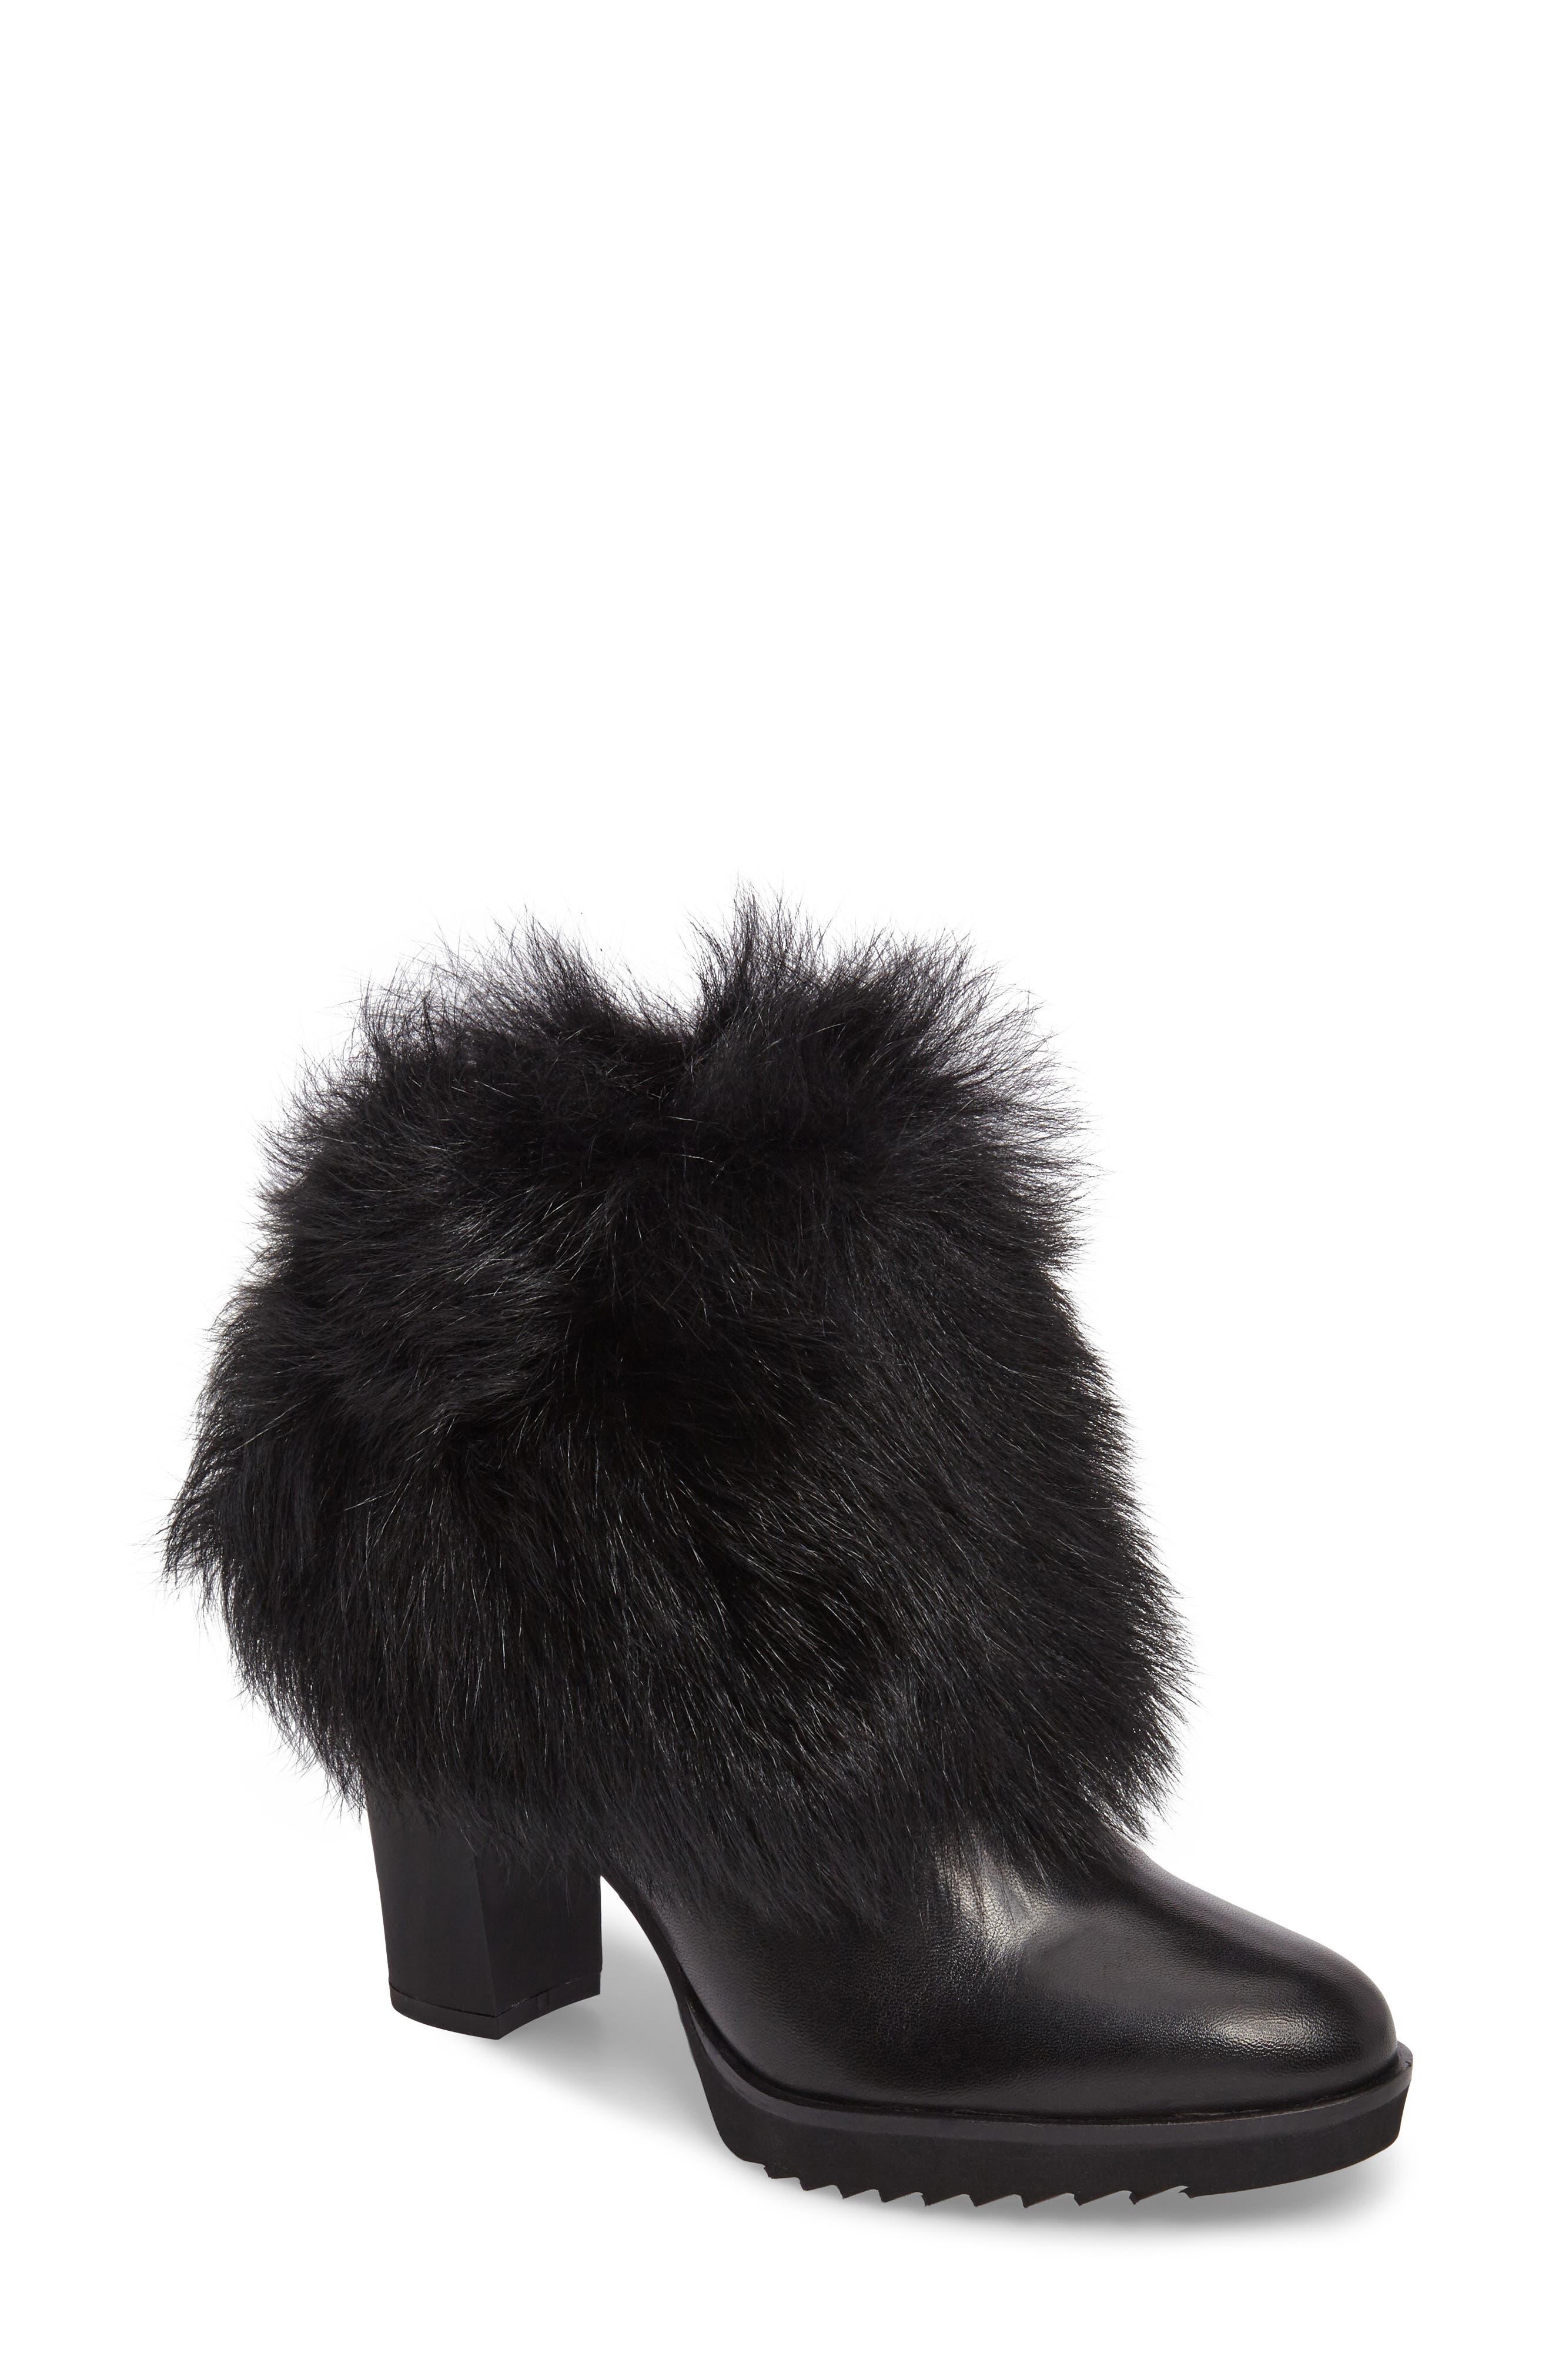 Roslyn Block Heel Genuine Shearling Bootie,                             Main thumbnail 1, color,                             Black Leather